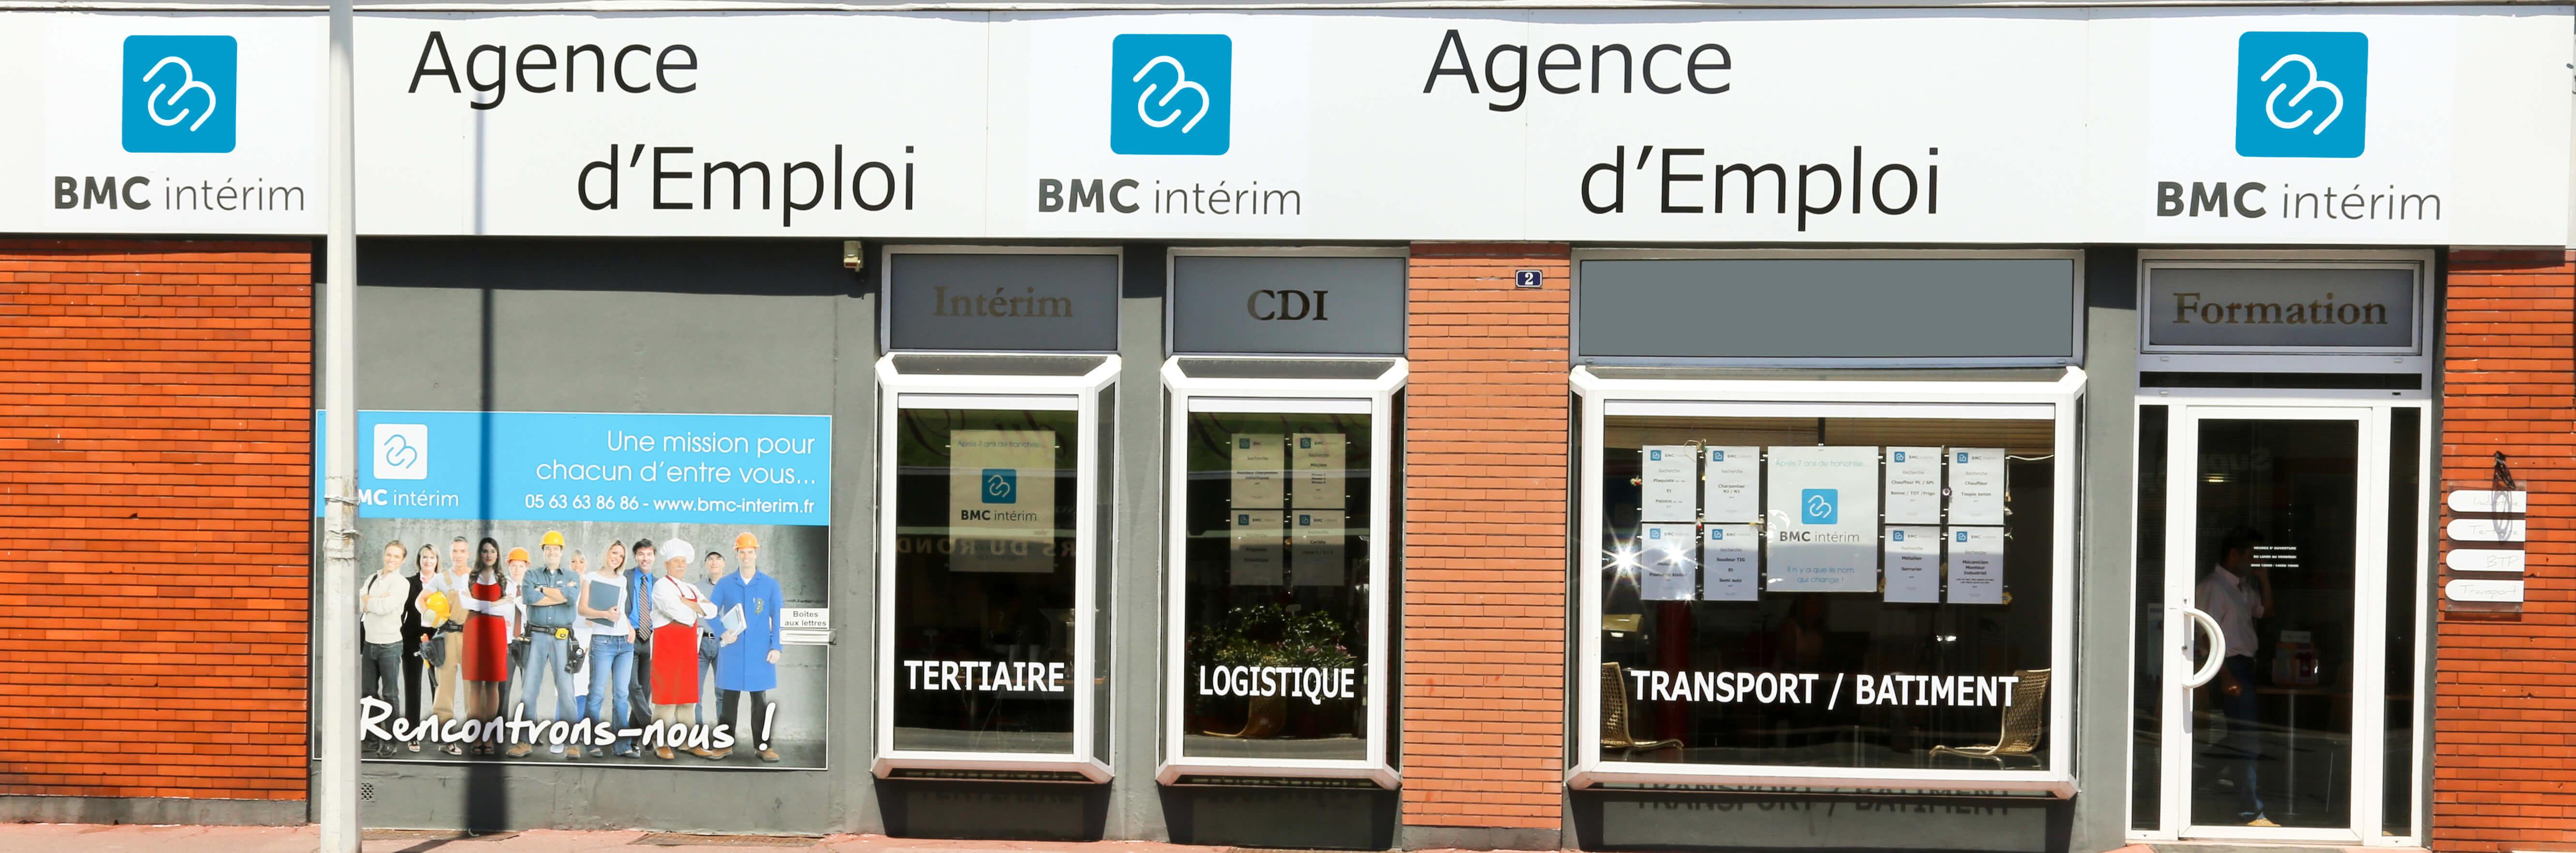 BMC Intérim (23) - Copie